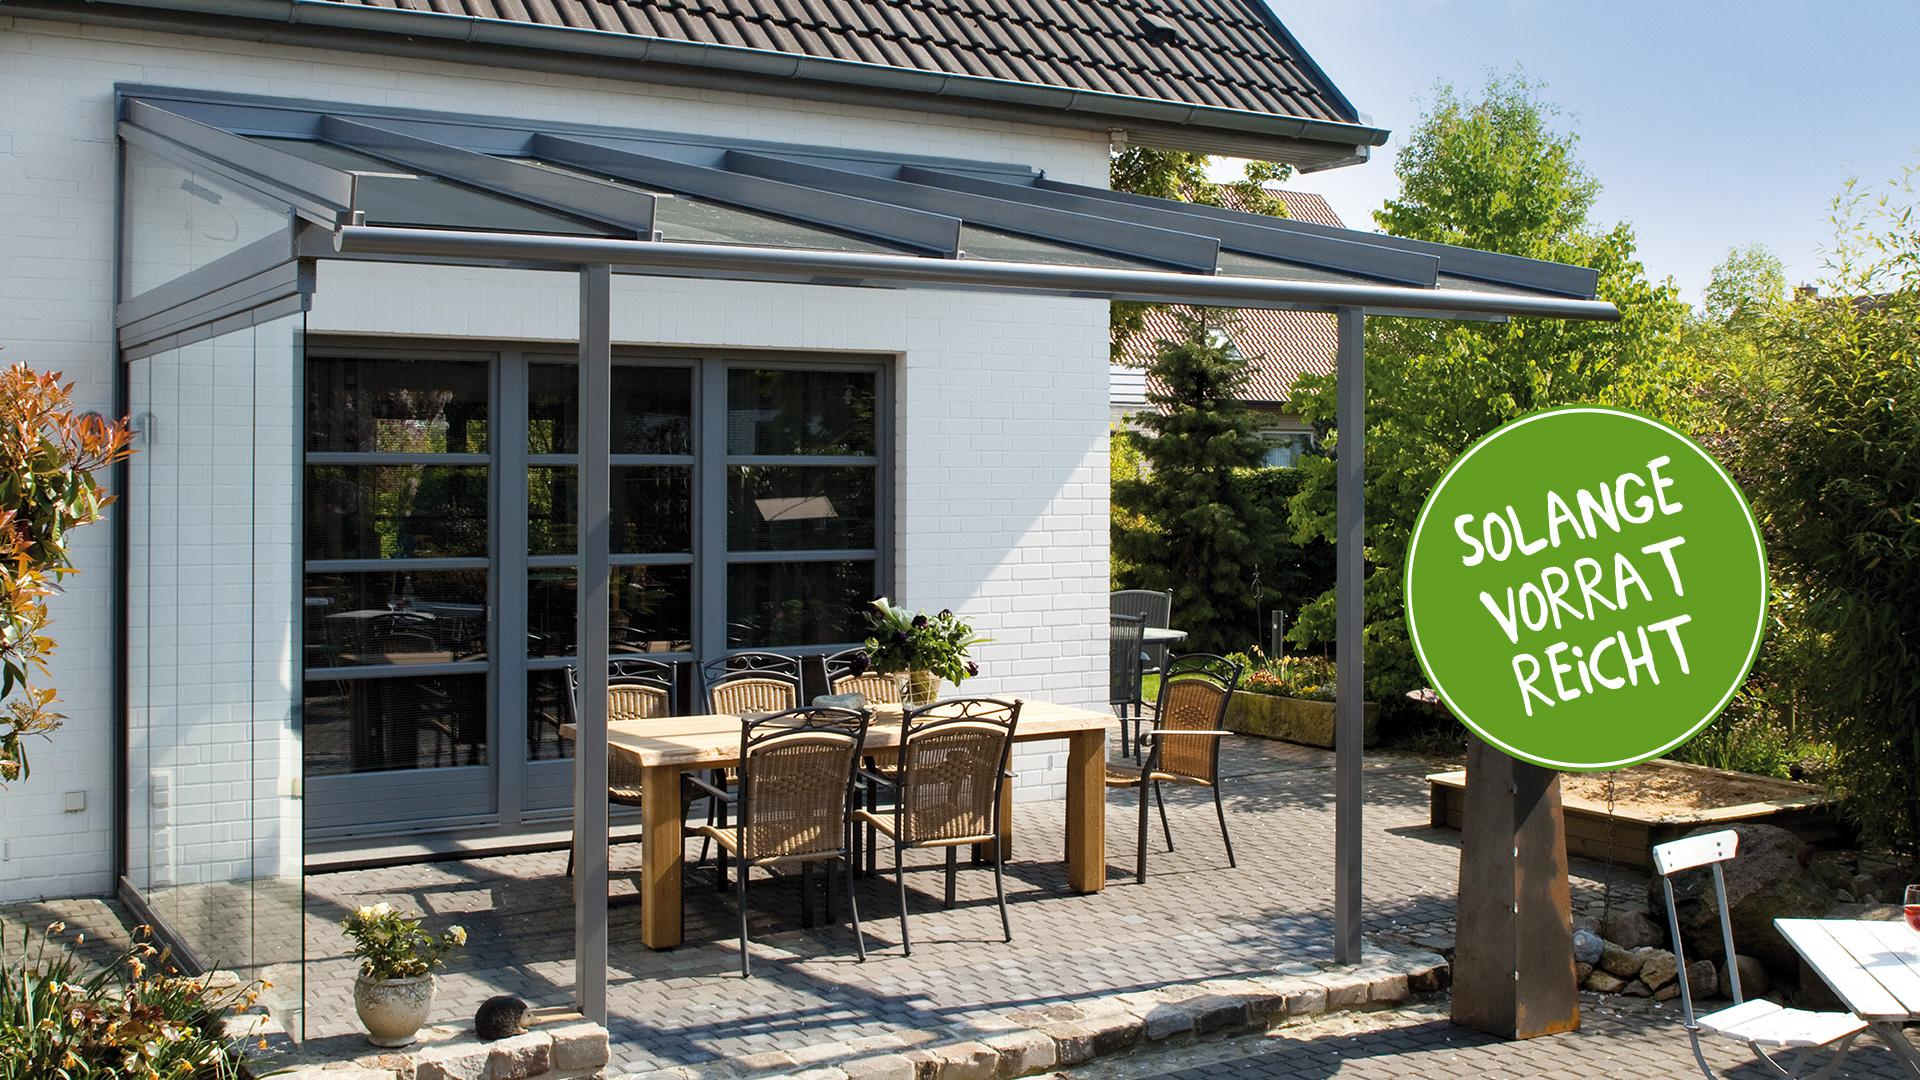 Linara Terrassenüberdachung zum Aktionspreis